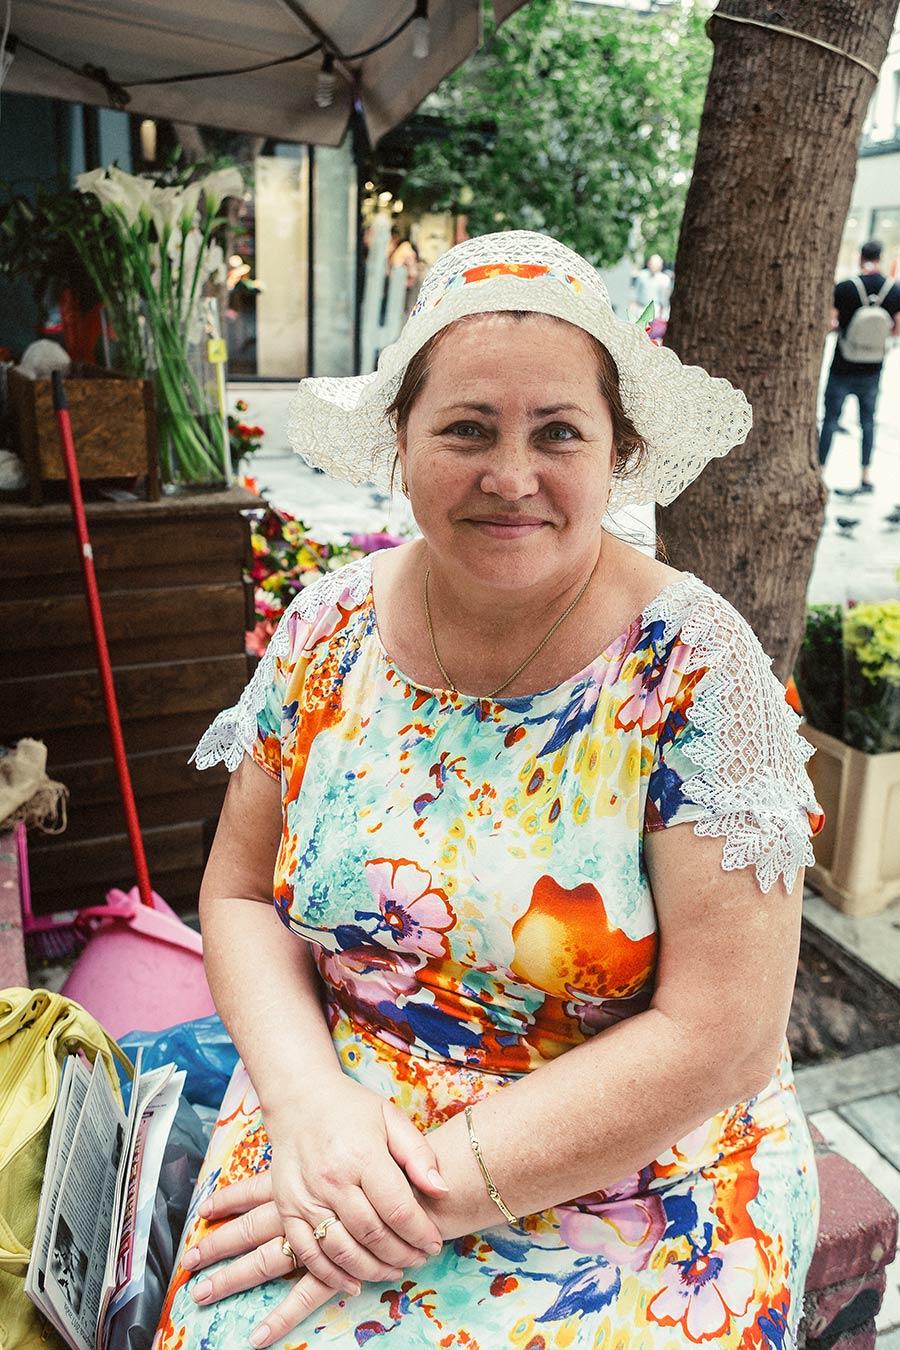 Athen, Griechenland (Mai 2017) - Ermou-Straße